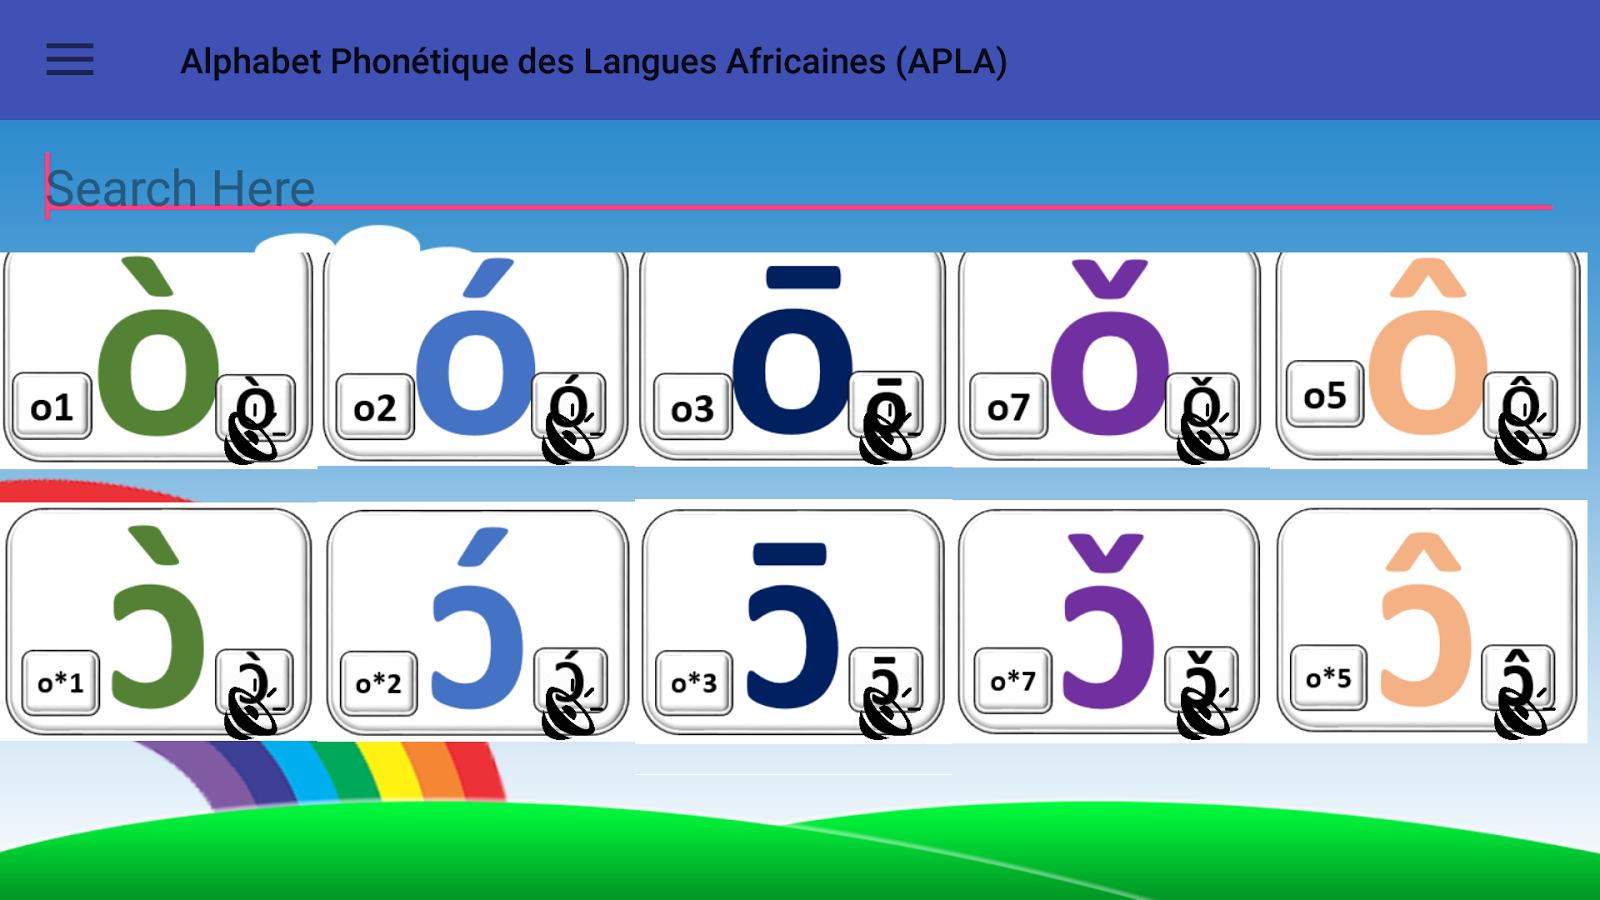 Alphabet phontique des langues africaines android apps on alphabet phontique des langues africaines screenshot biocorpaavc